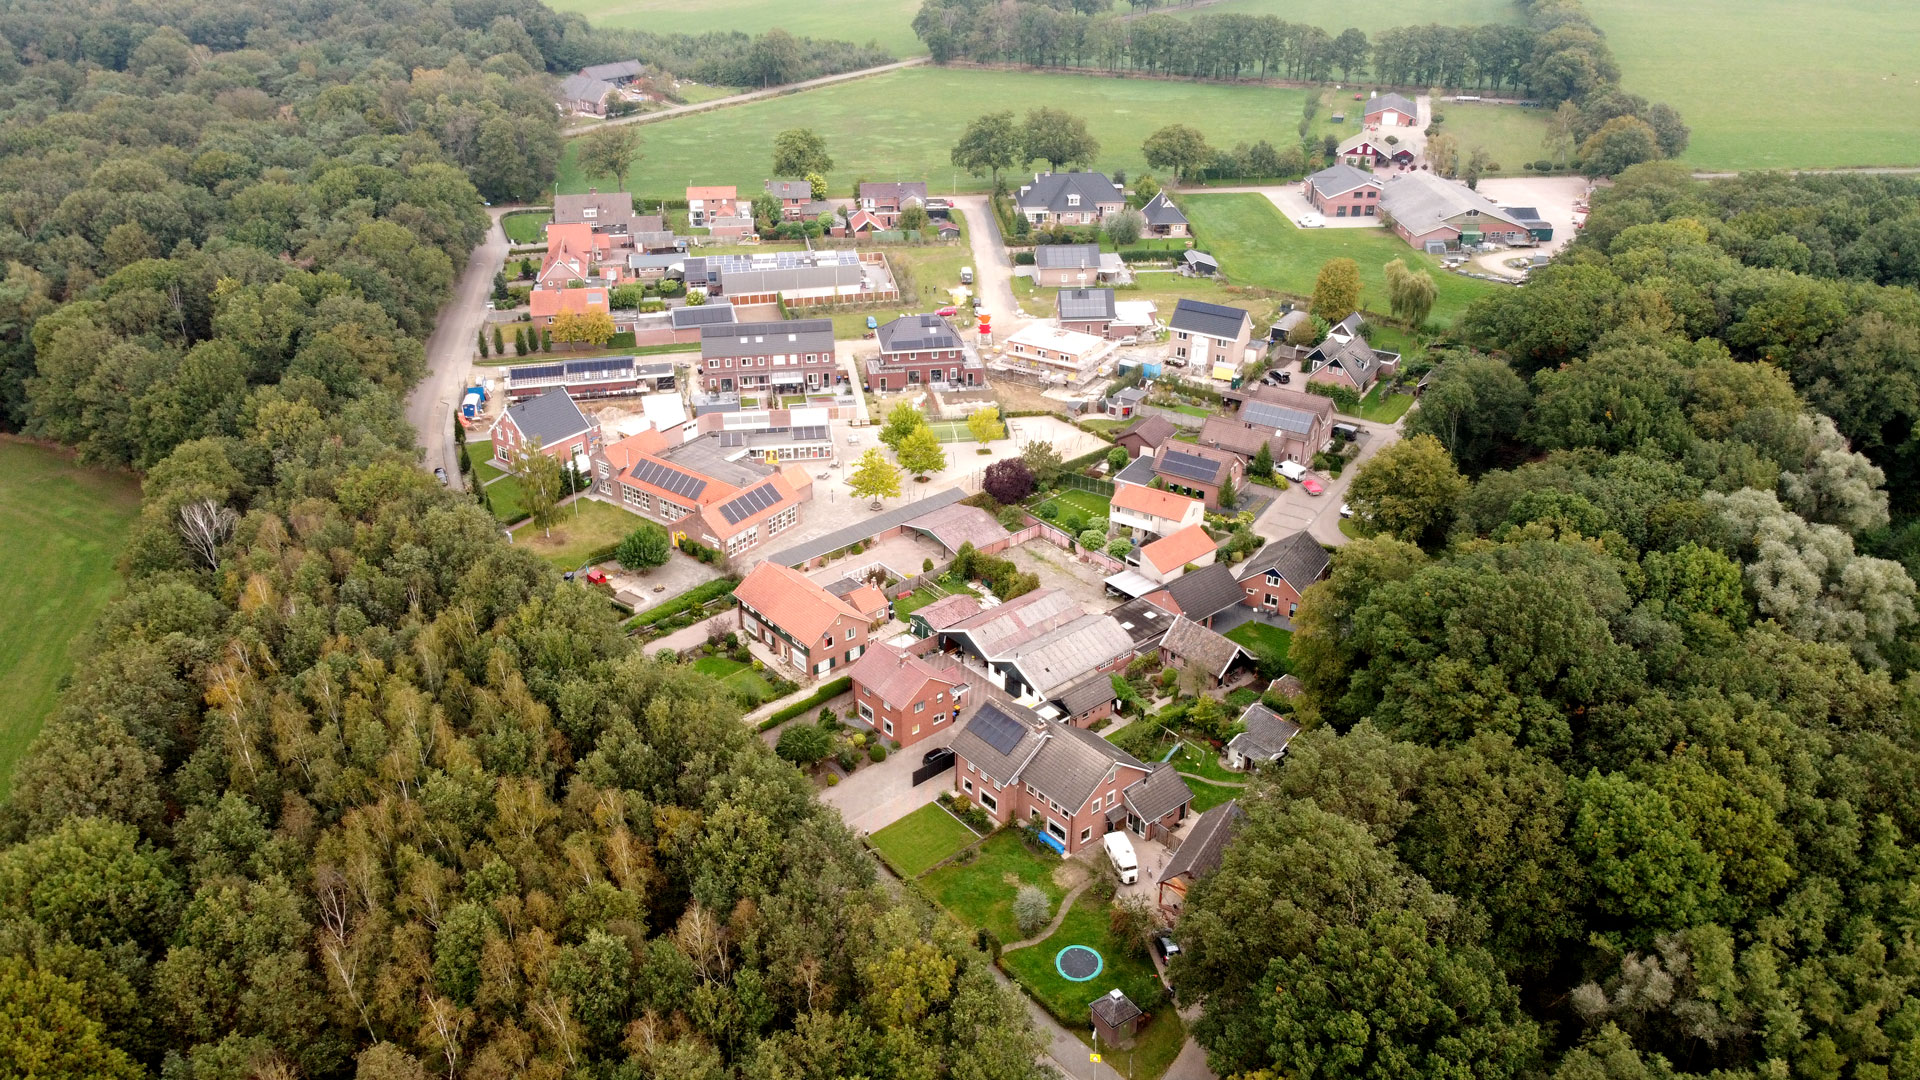 Buurtschap Zwolle